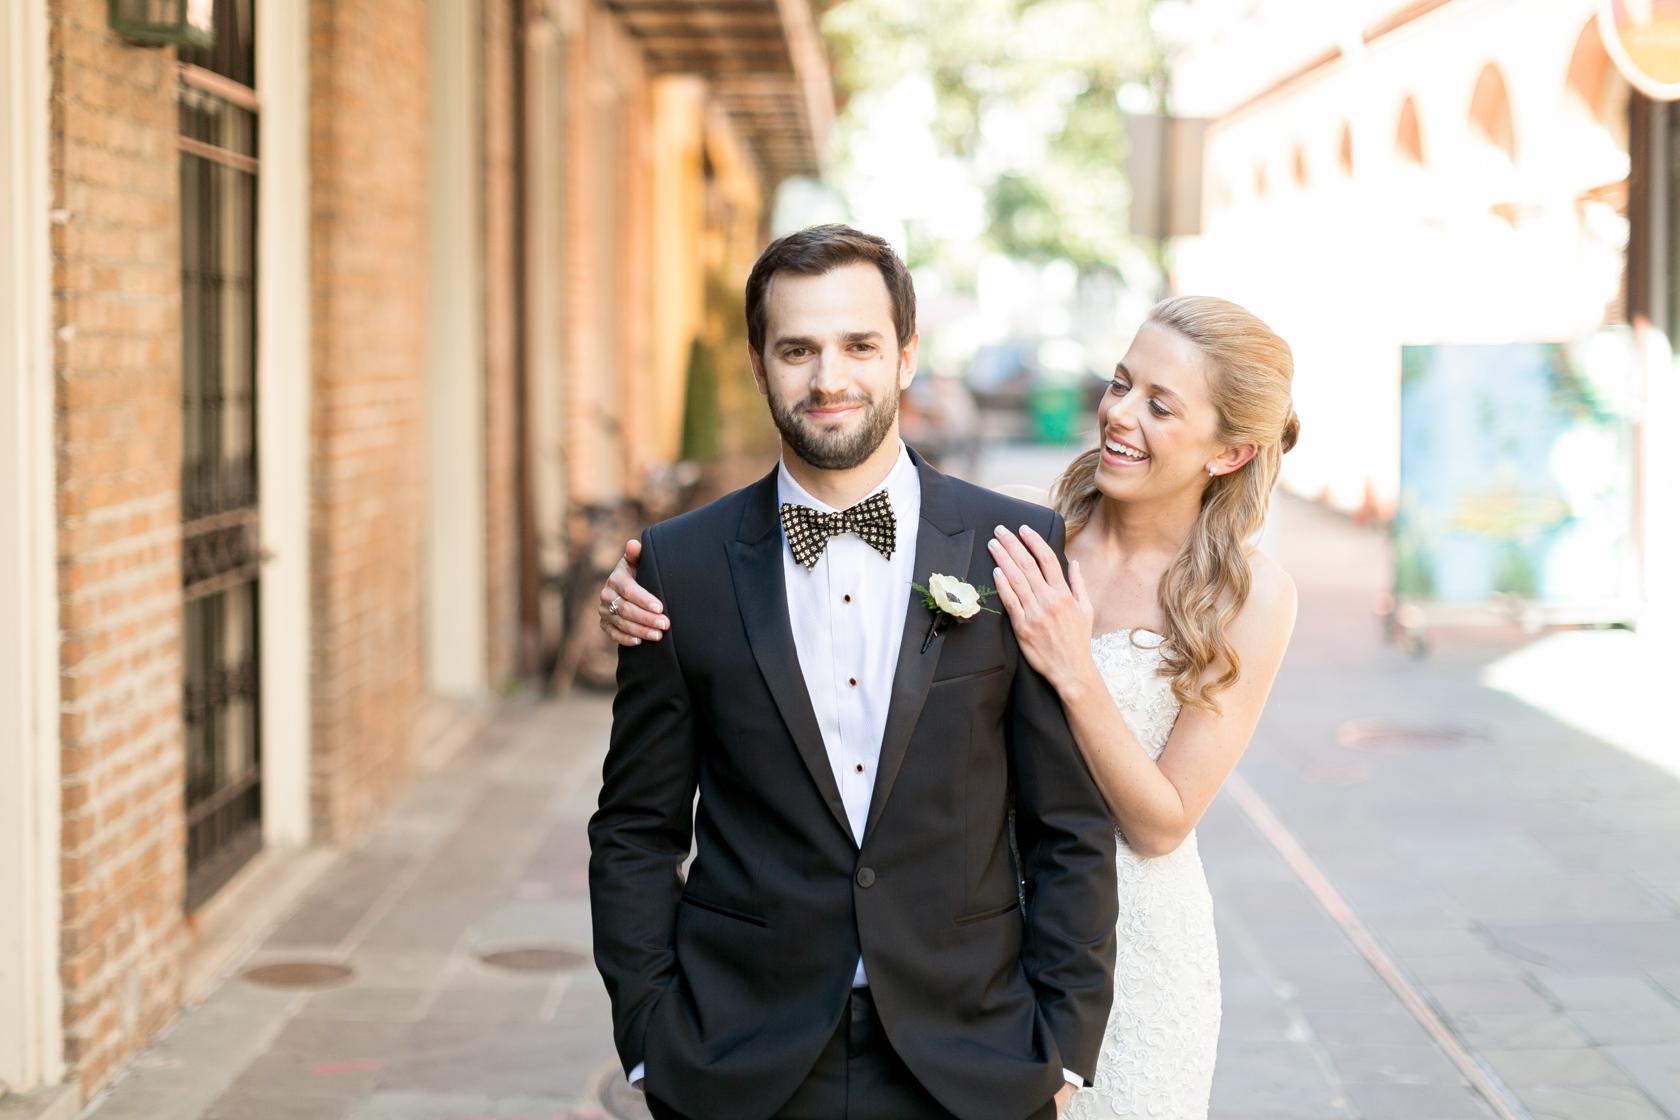 omni royal orleans wedding first look